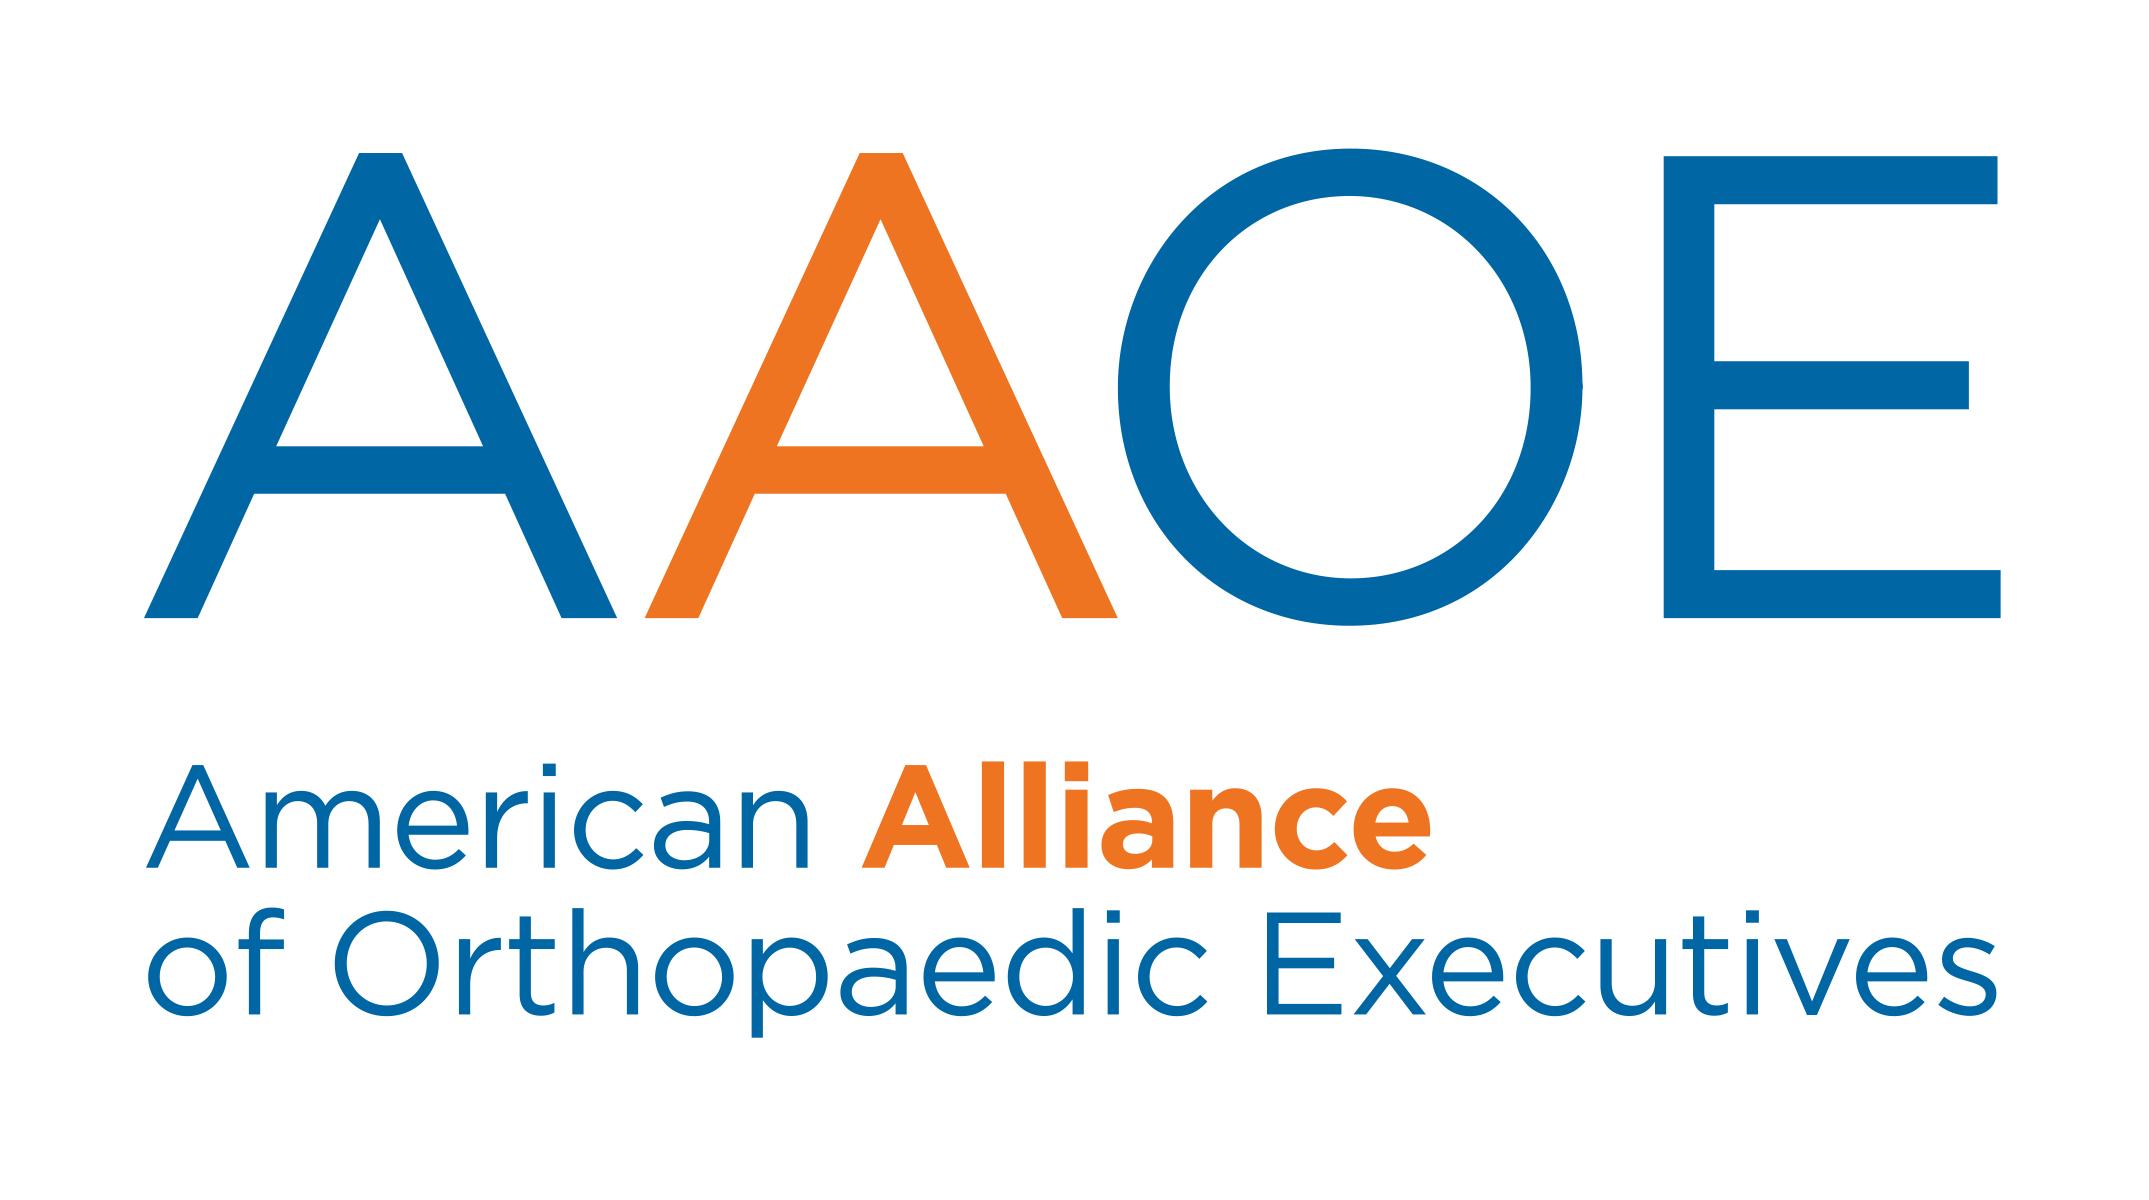 American Alliance of Orthopaedic Executives (AAOE)